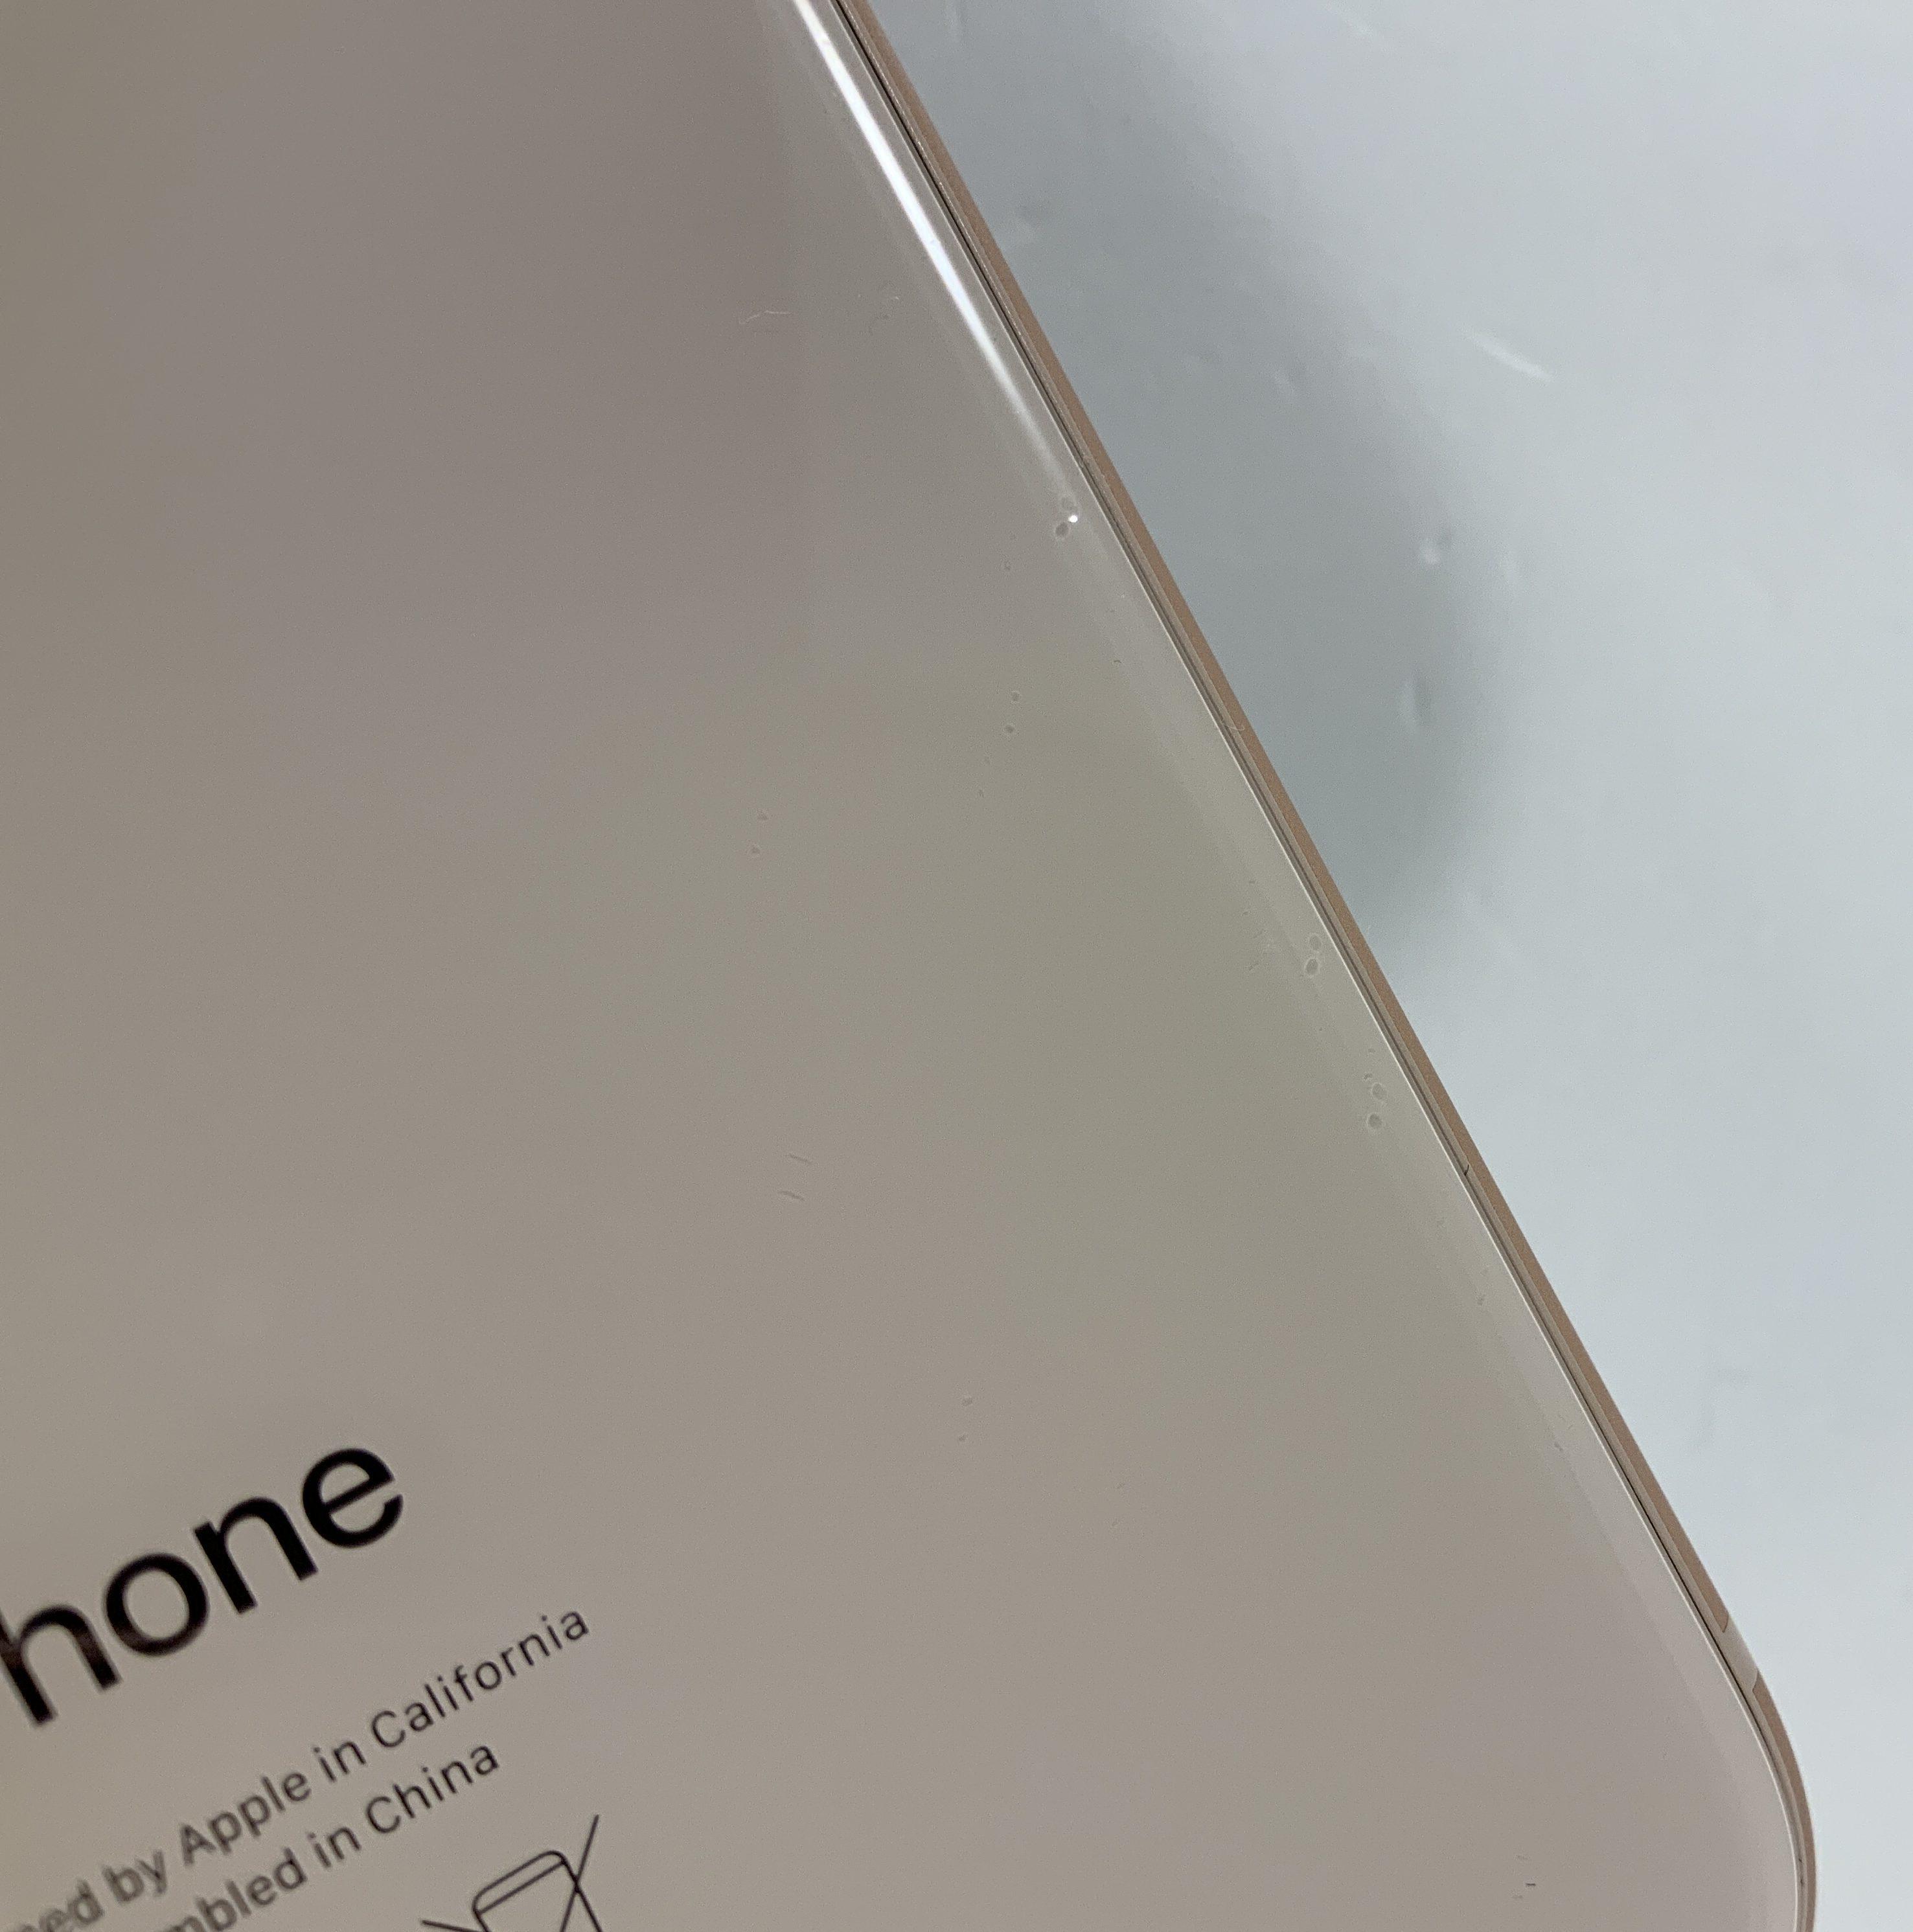 iPhone 8 Plus 64GB, 64GB, Gold, obraz 3